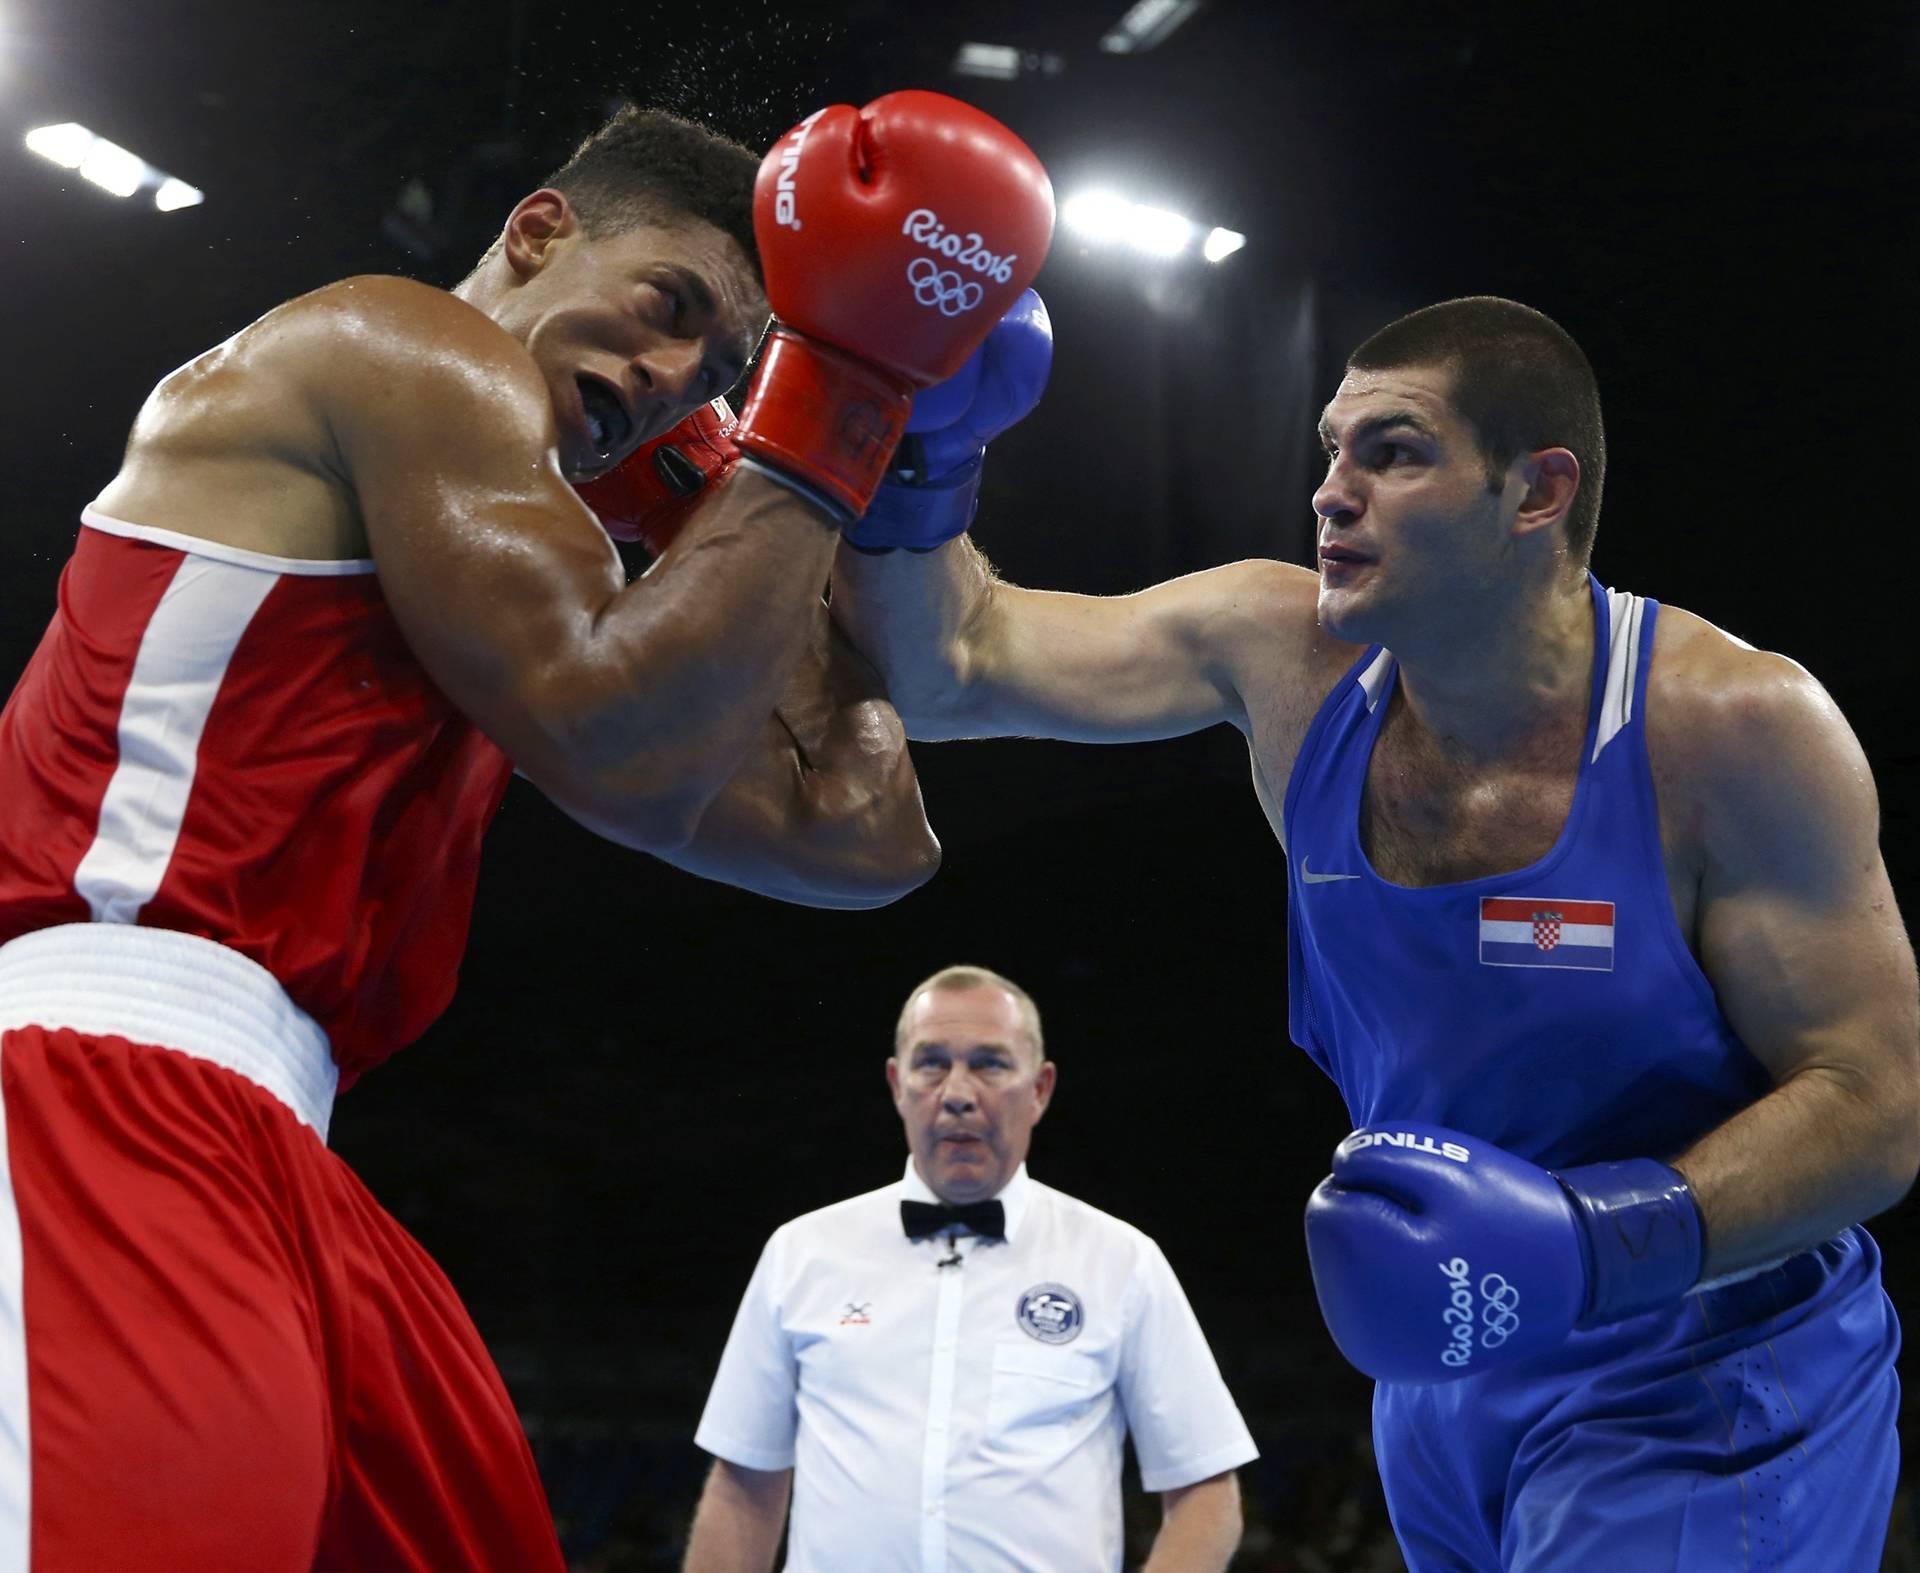 Boxing - Men's Super Heavy (+91kg) Semifinals Bout 262